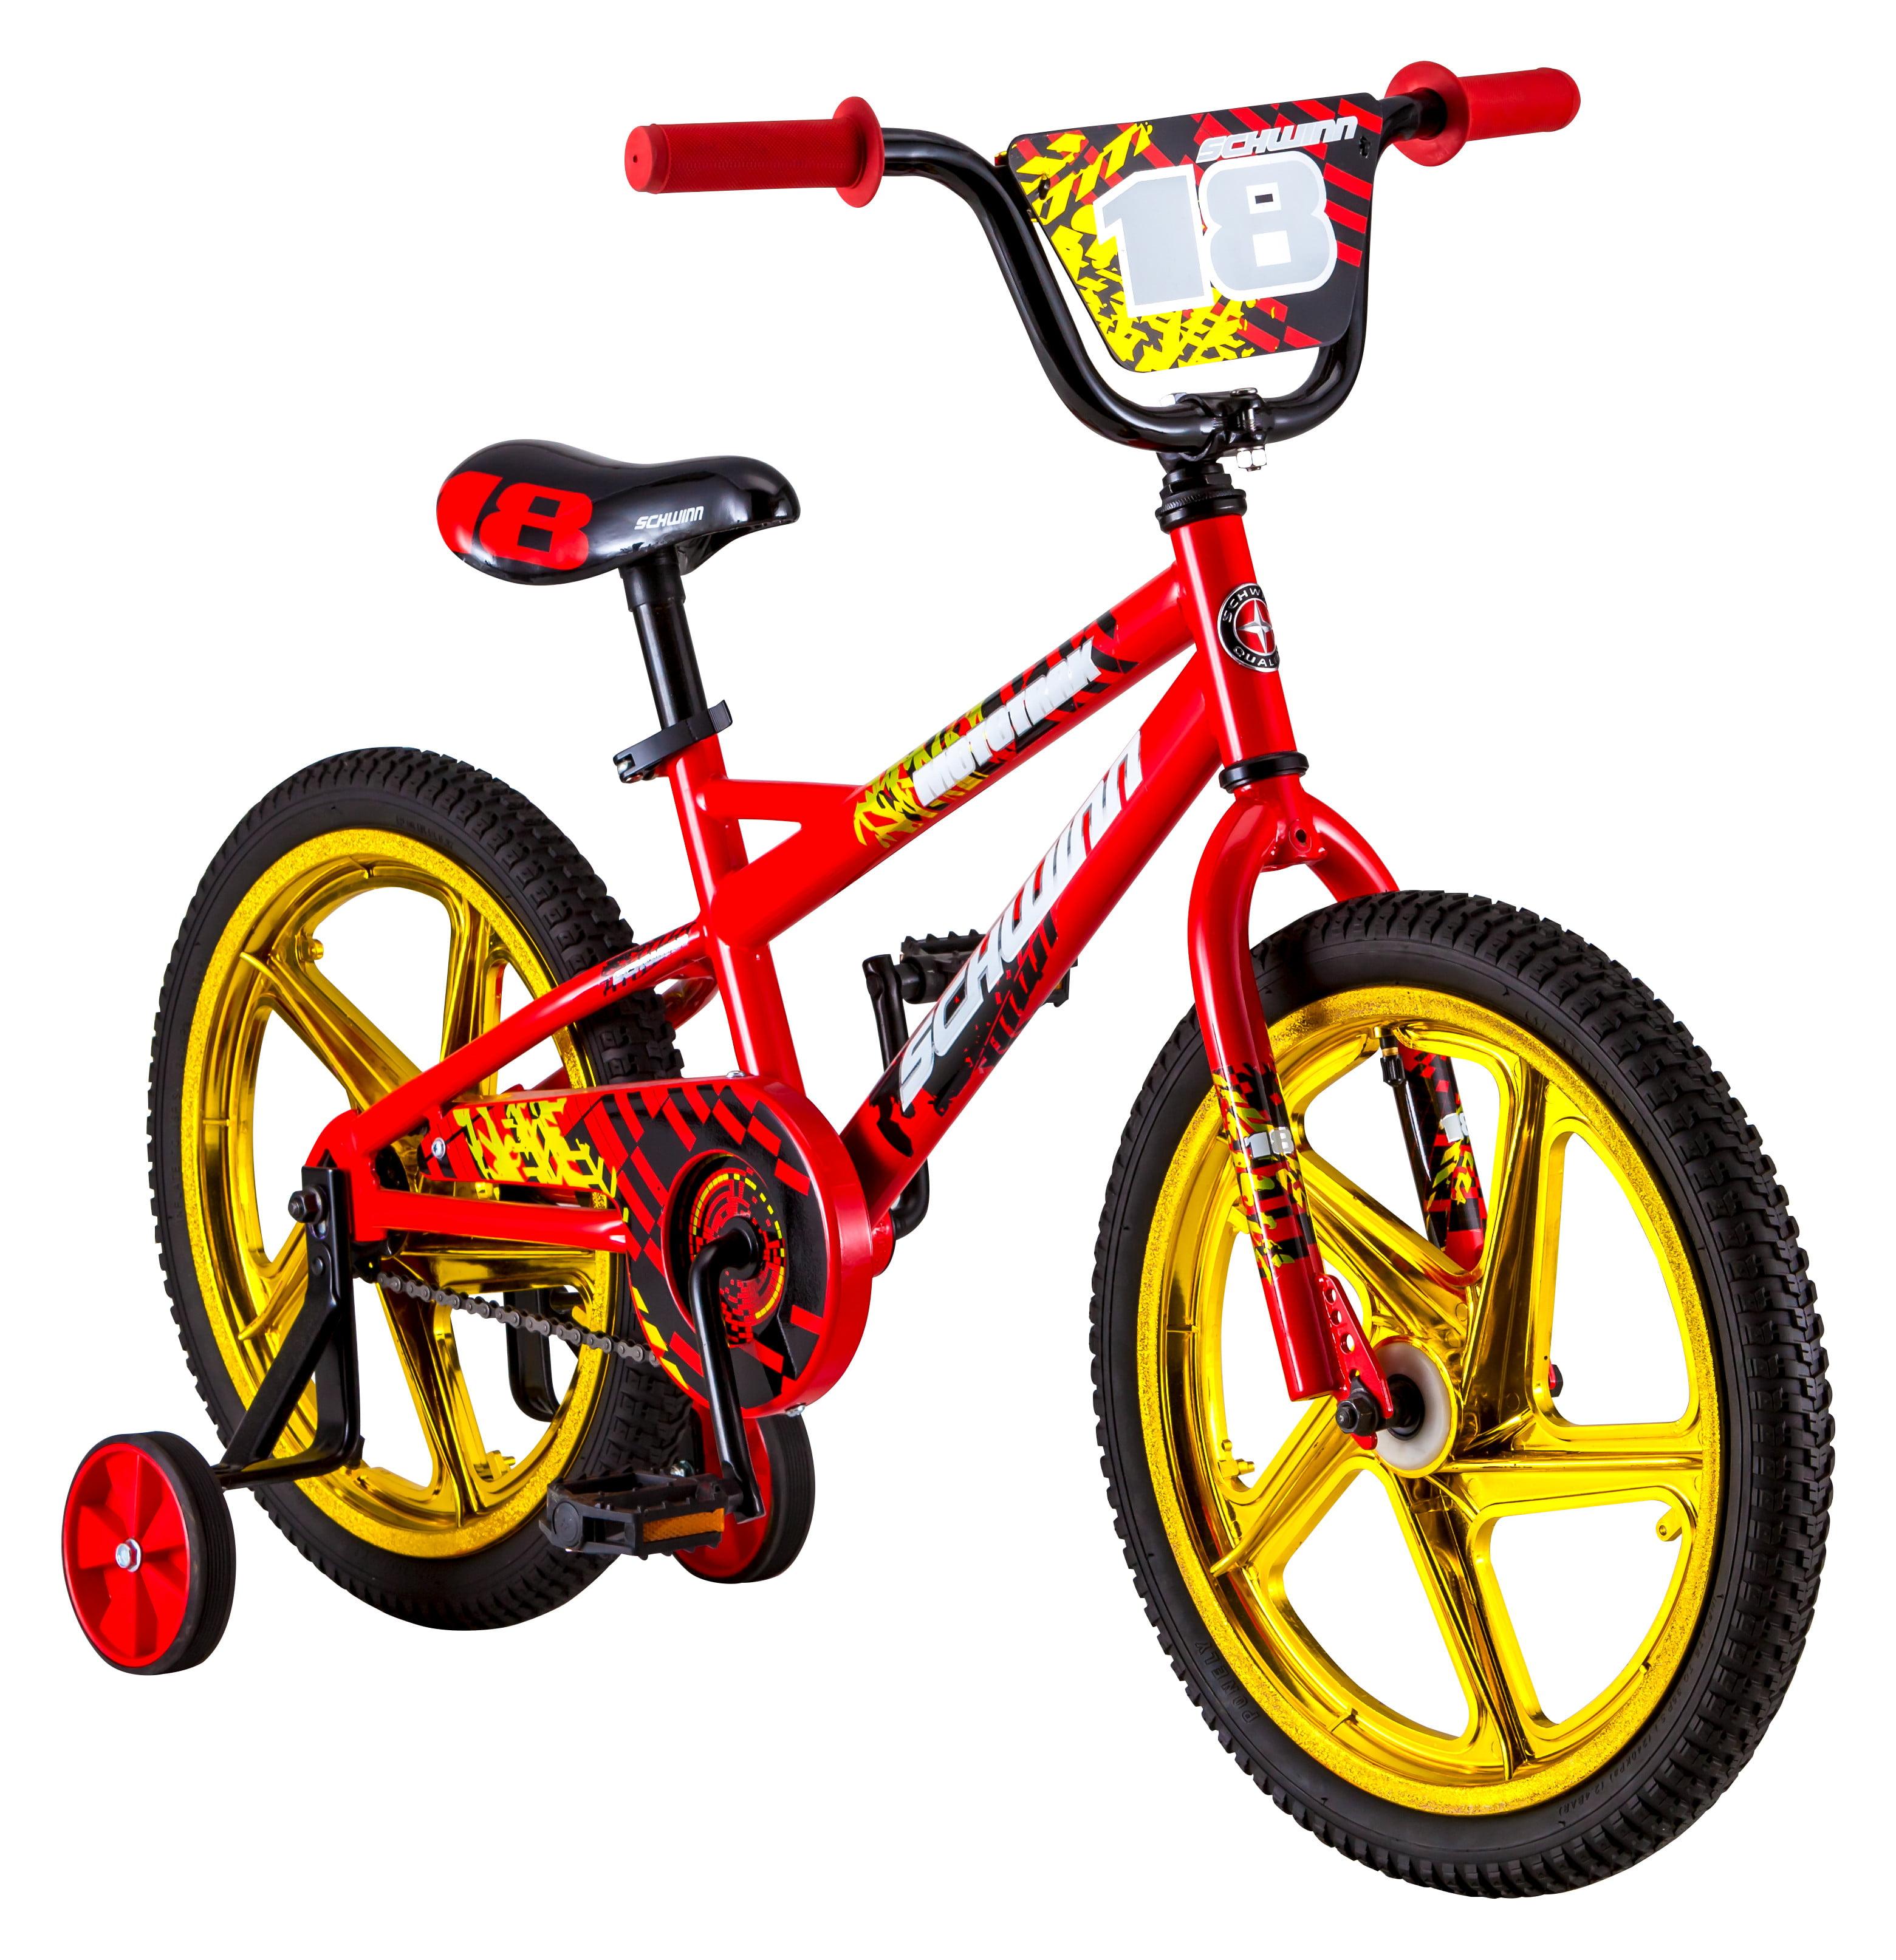 "18"" Schwinn Mototrax Boy's Sidewalk Bike, Red by Pacific Cycle"